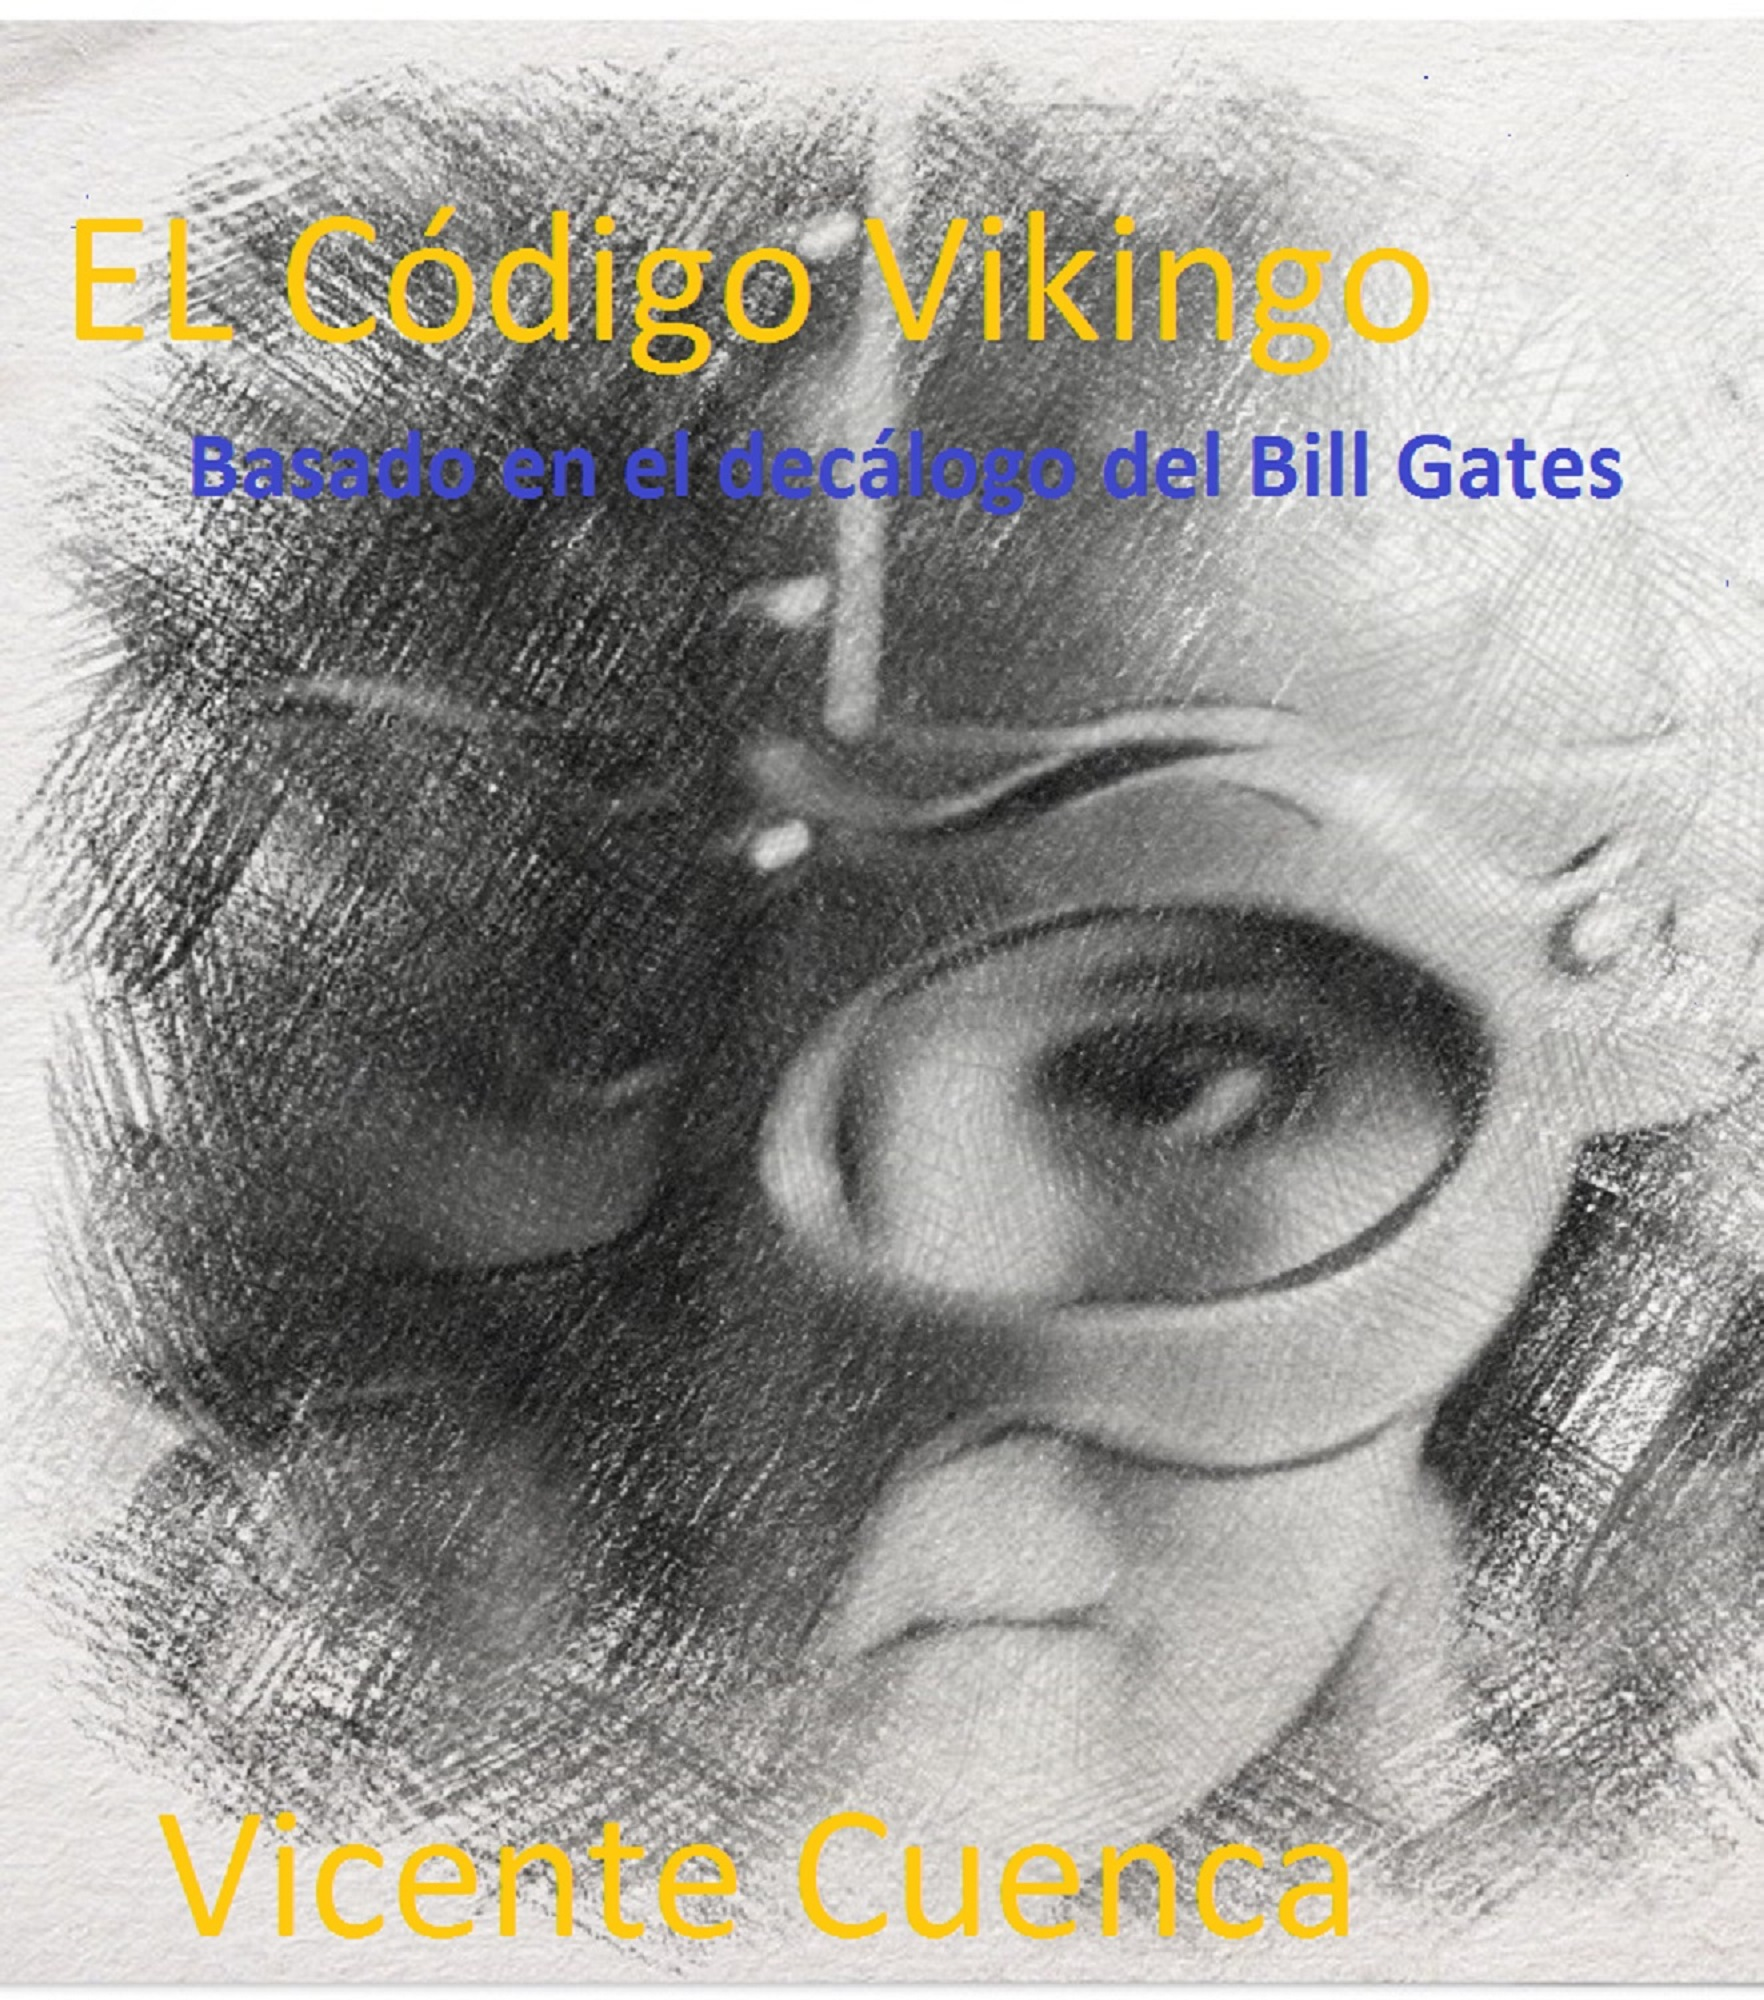 El código vikingo